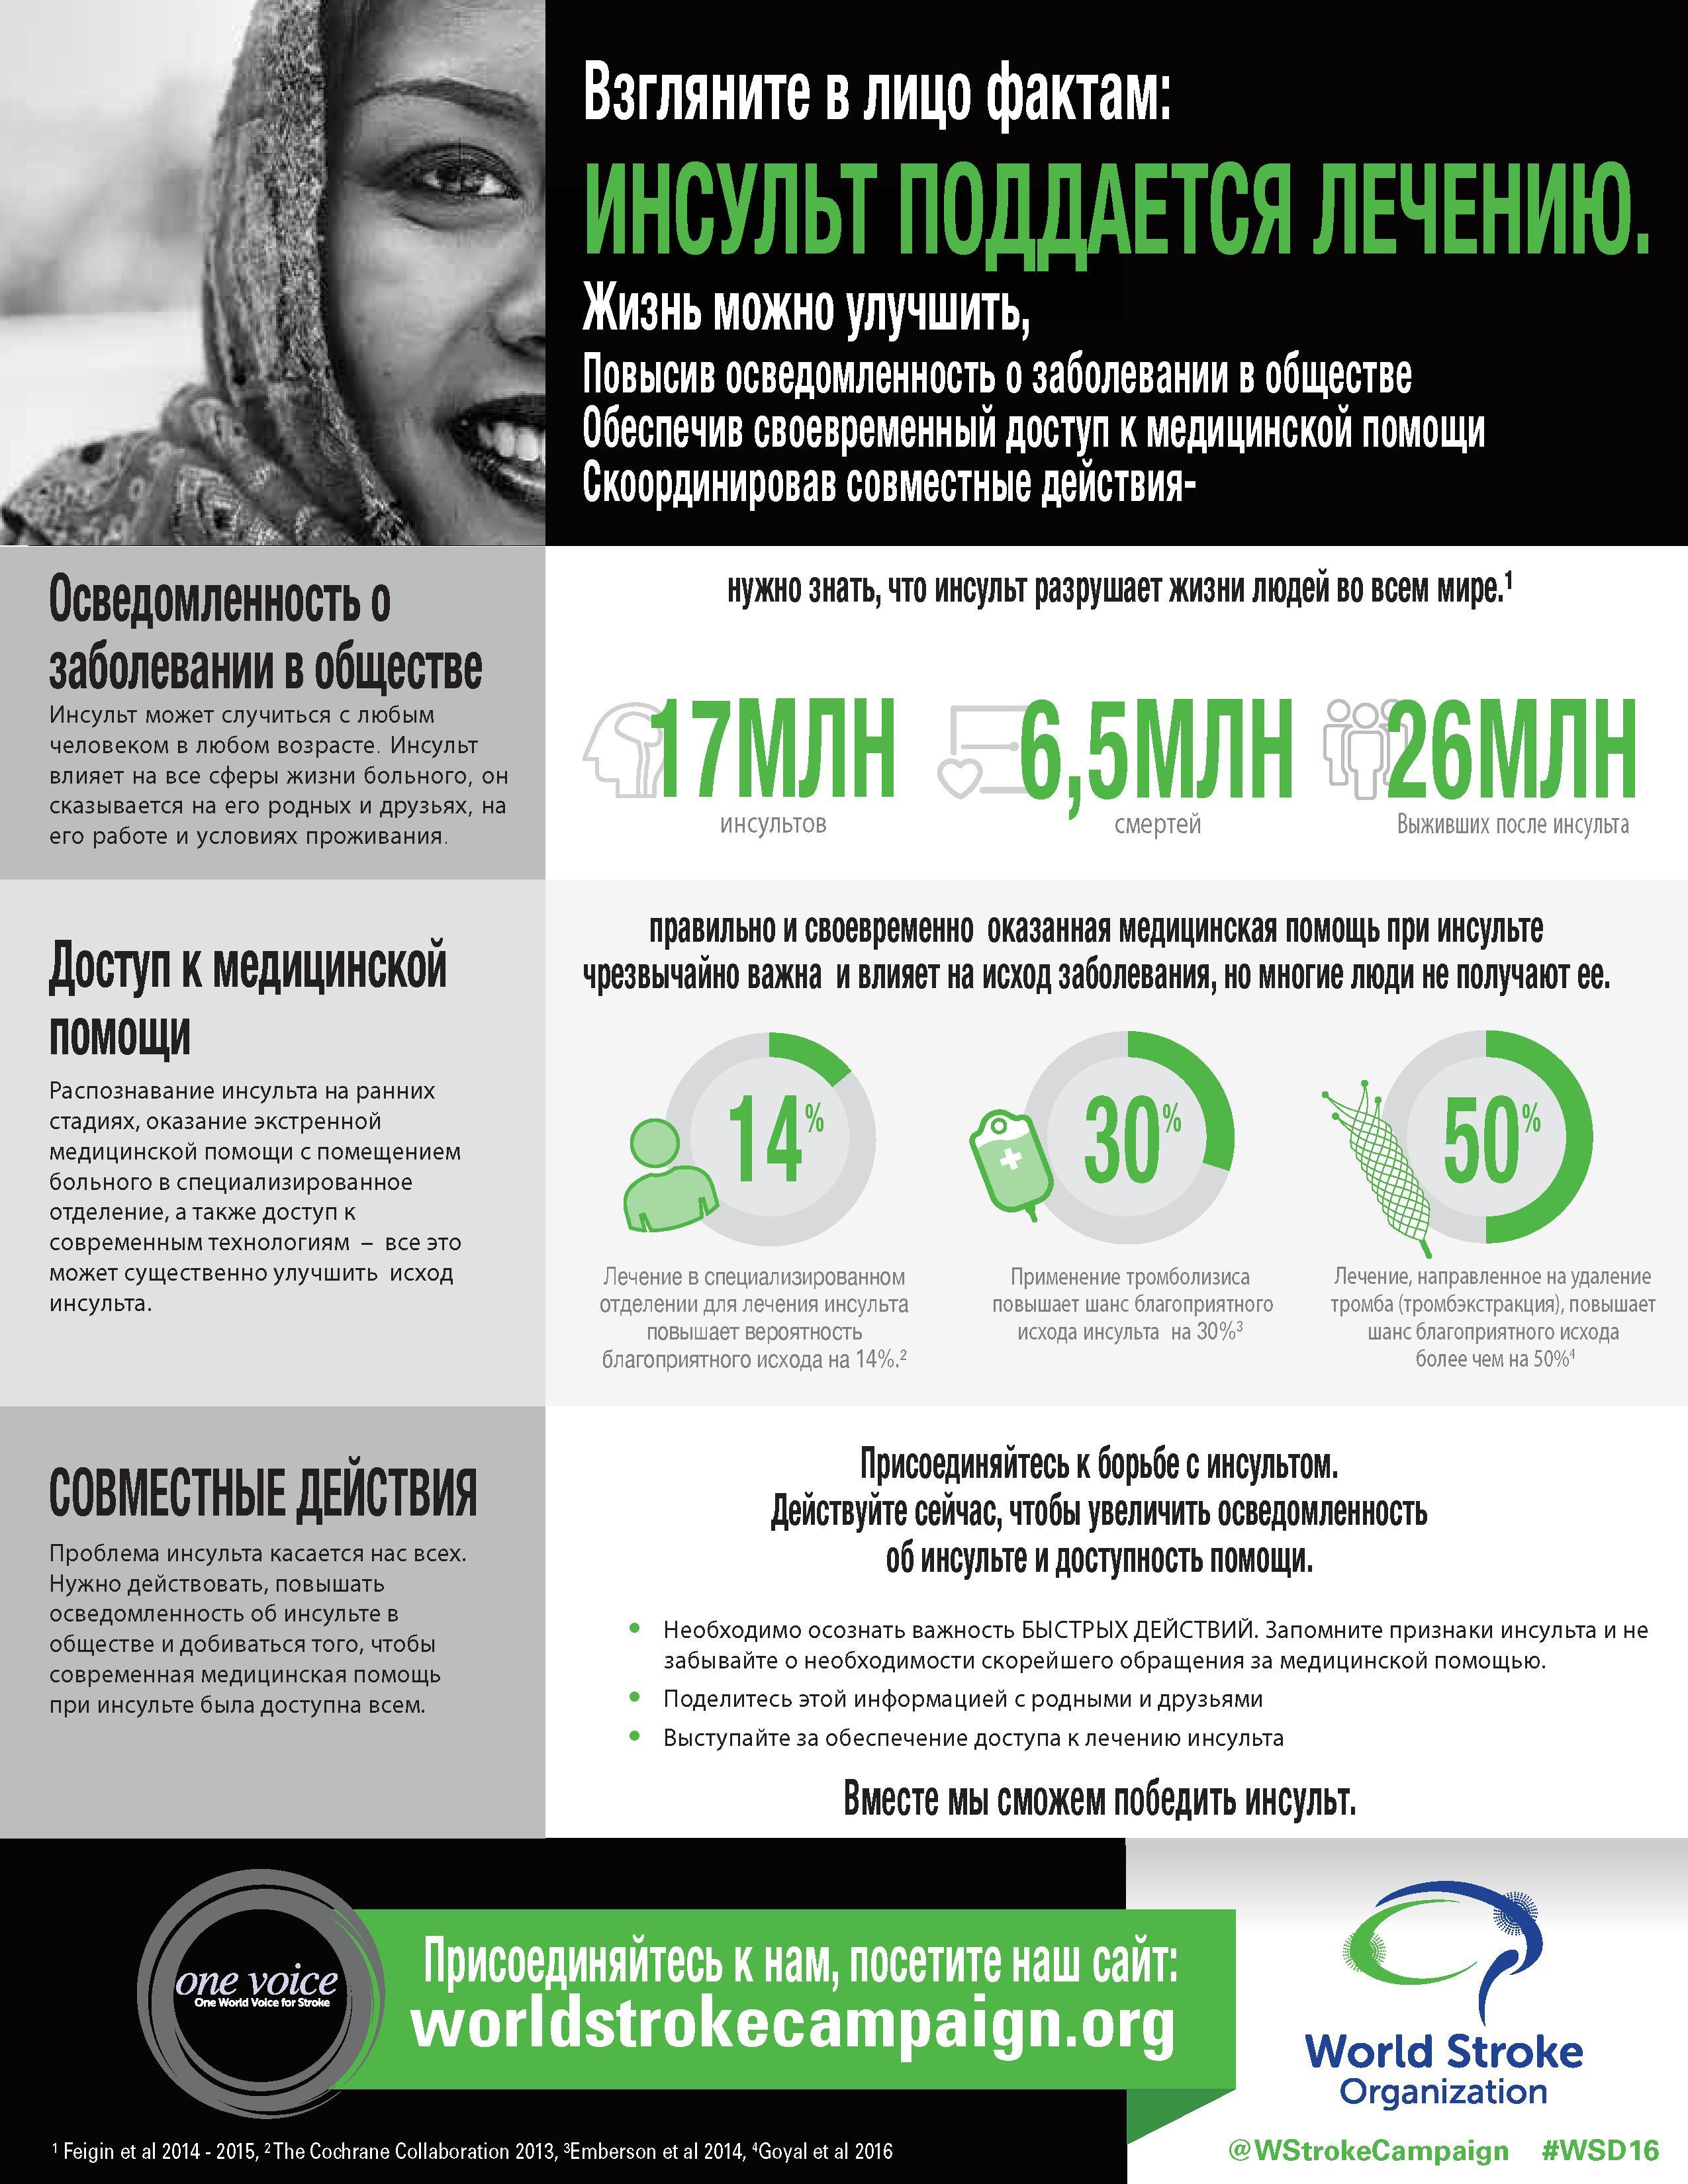 russian-infographic-wso-wsd-2016